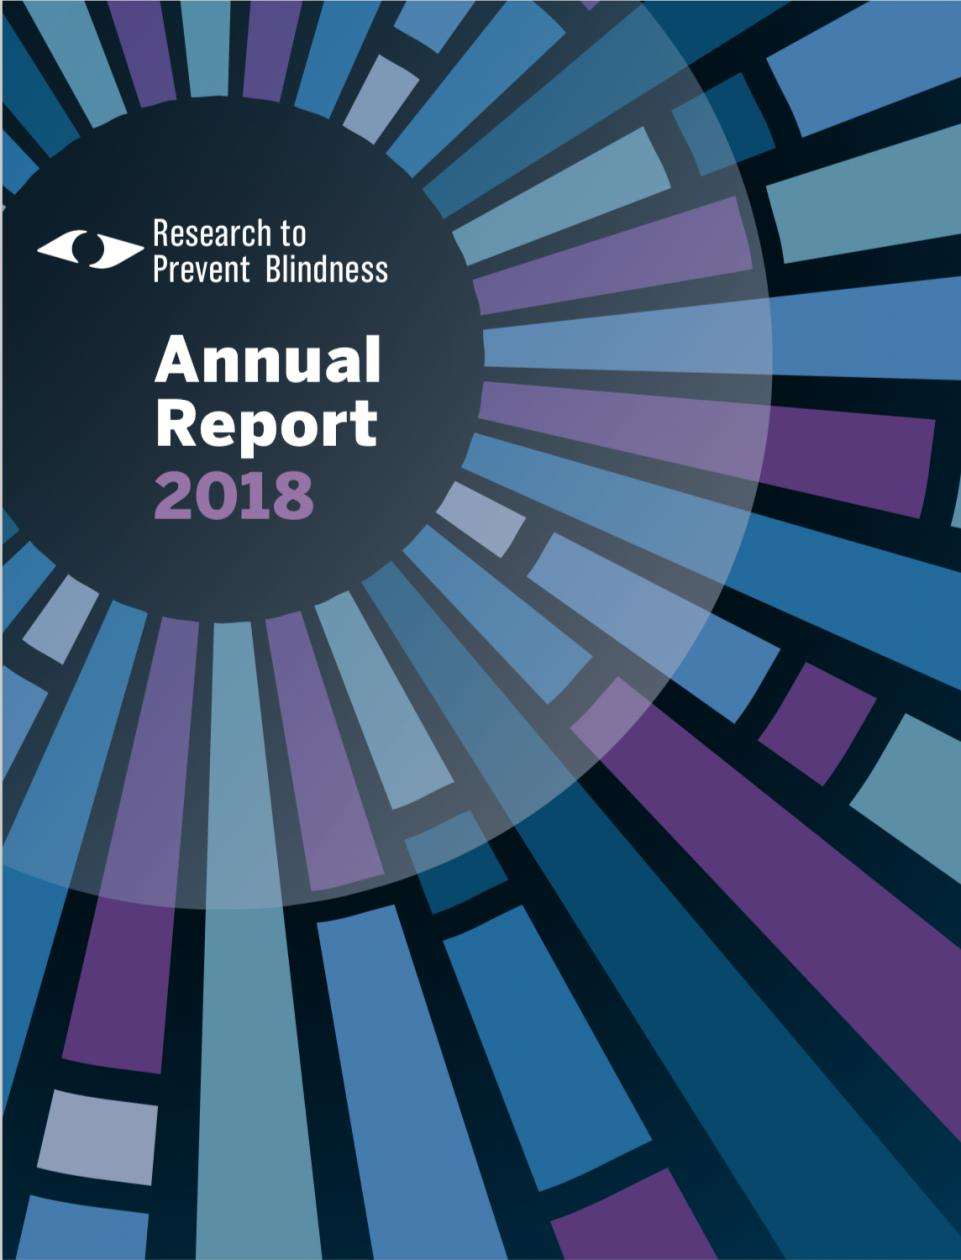 RPB 2018 Annual Report